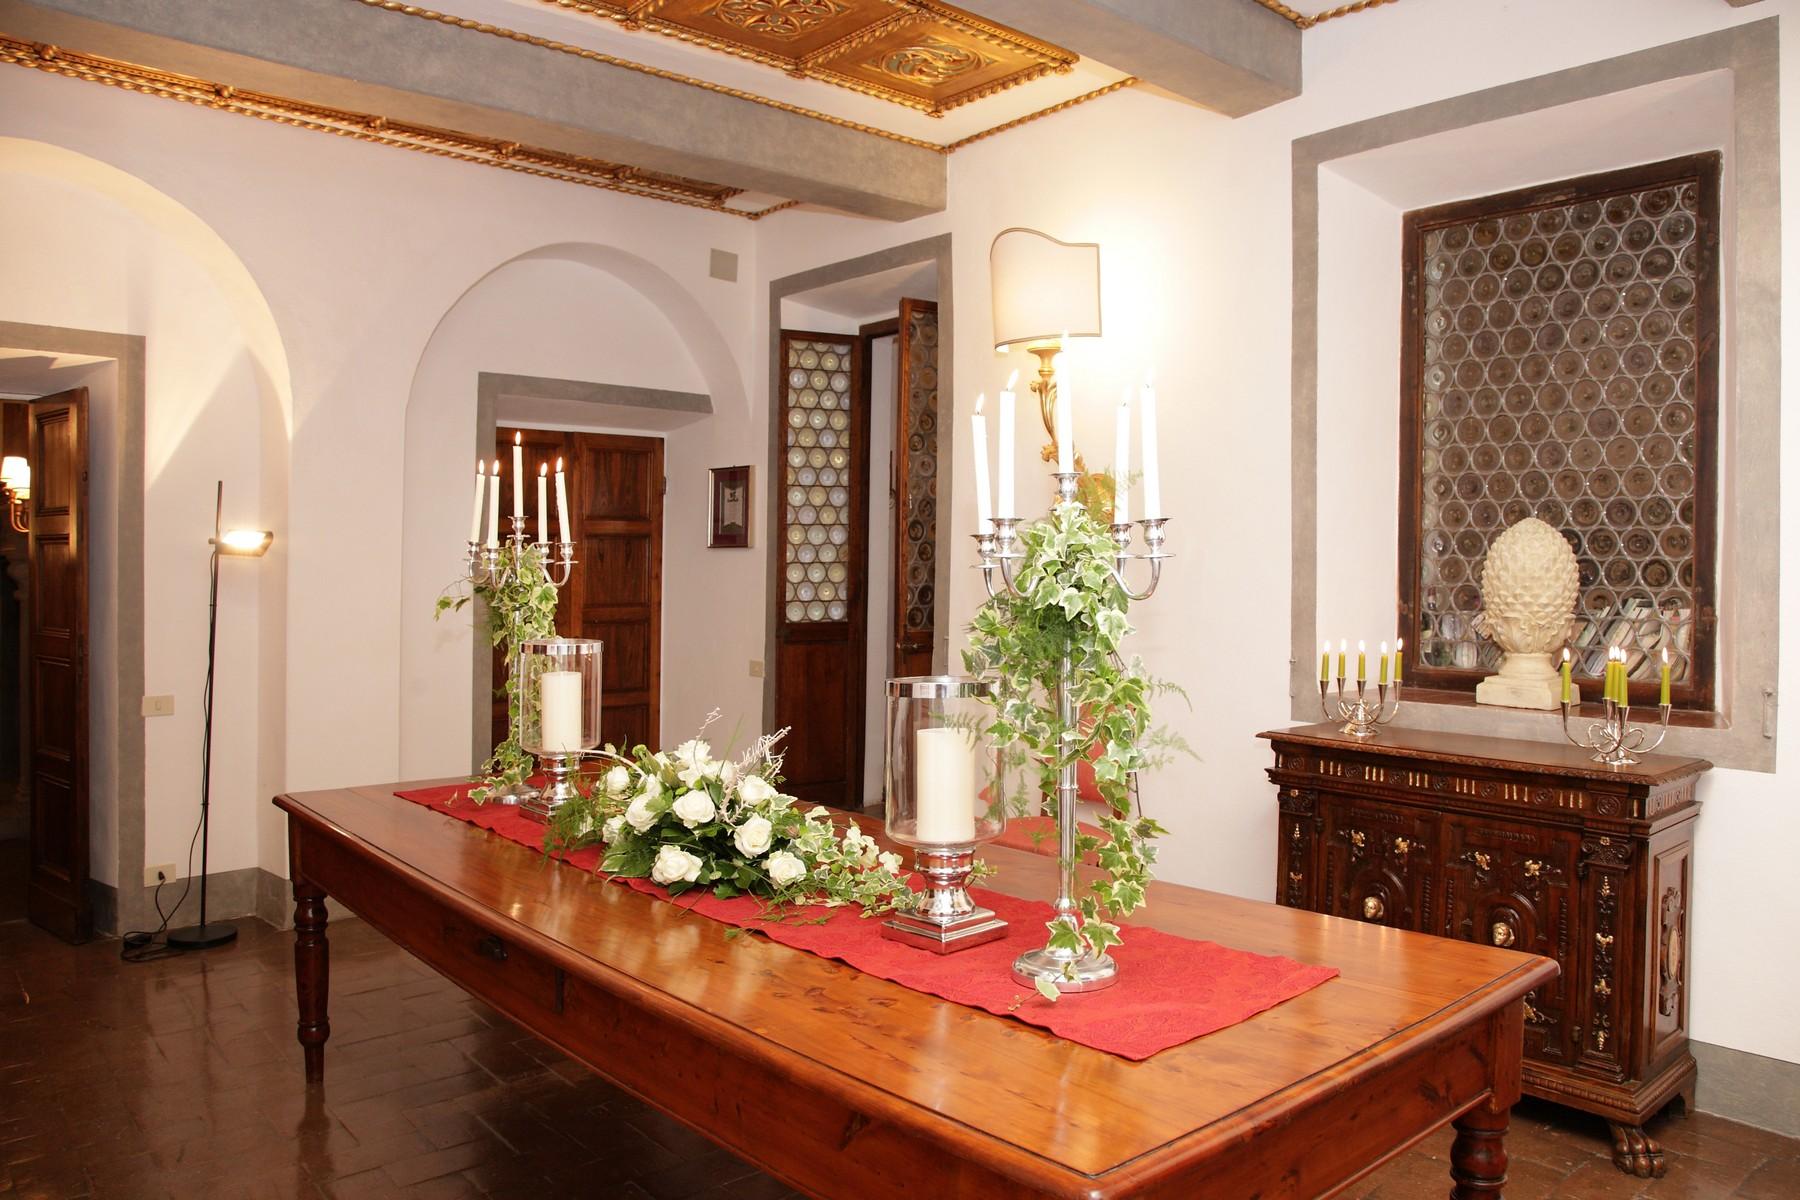 Villa in Vendita a Gaiole In Chianti: 5 locali, 4285 mq - Foto 4